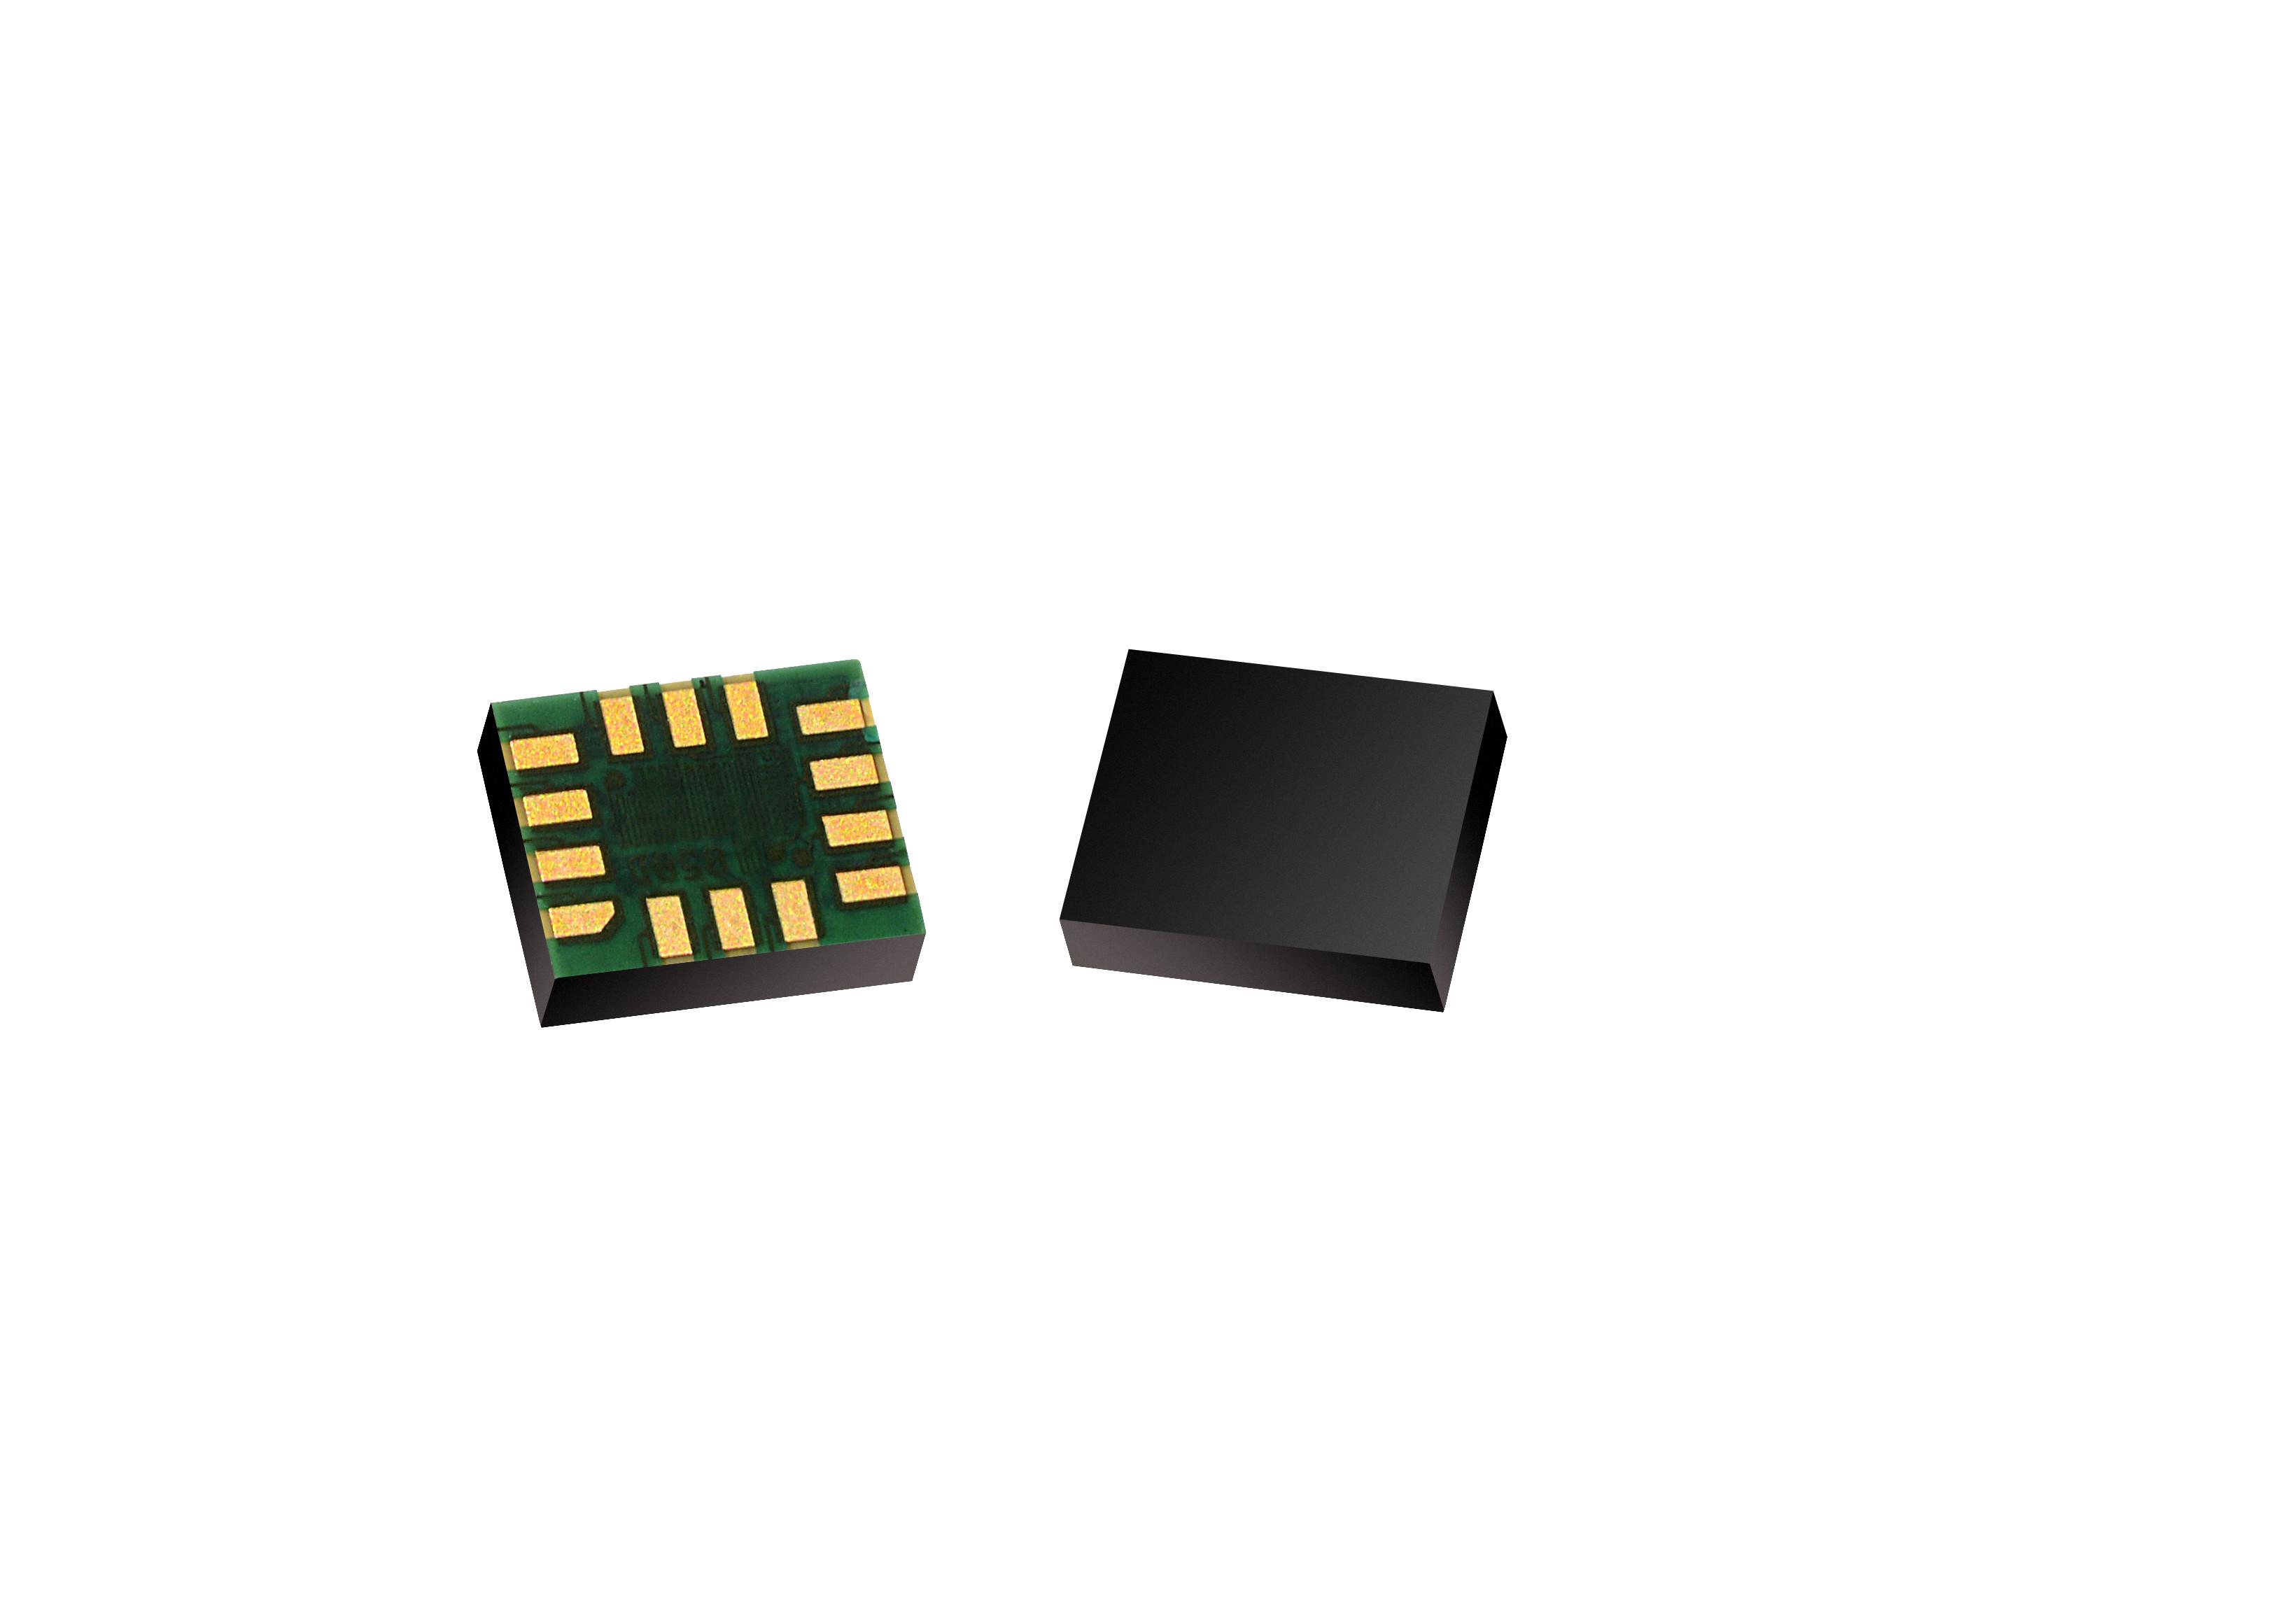 ST4223_LGA-14_3x2.5mm_LSM6DS3_LSM6DS3H-hpr.jpg